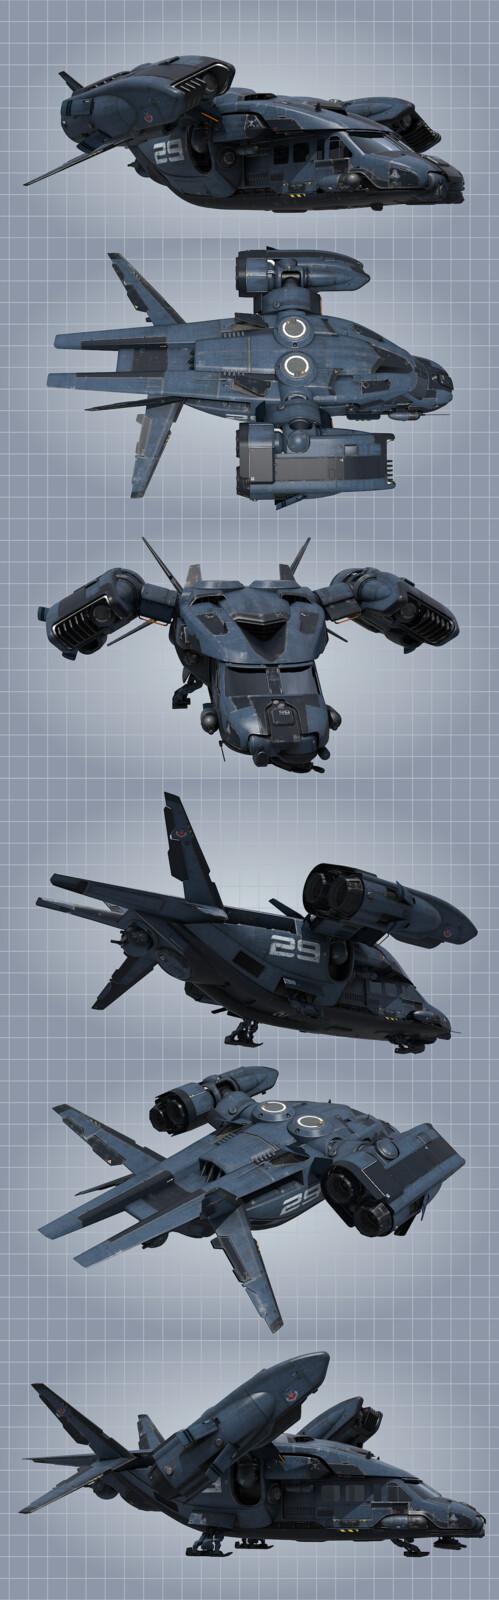 NovA29R 's concept